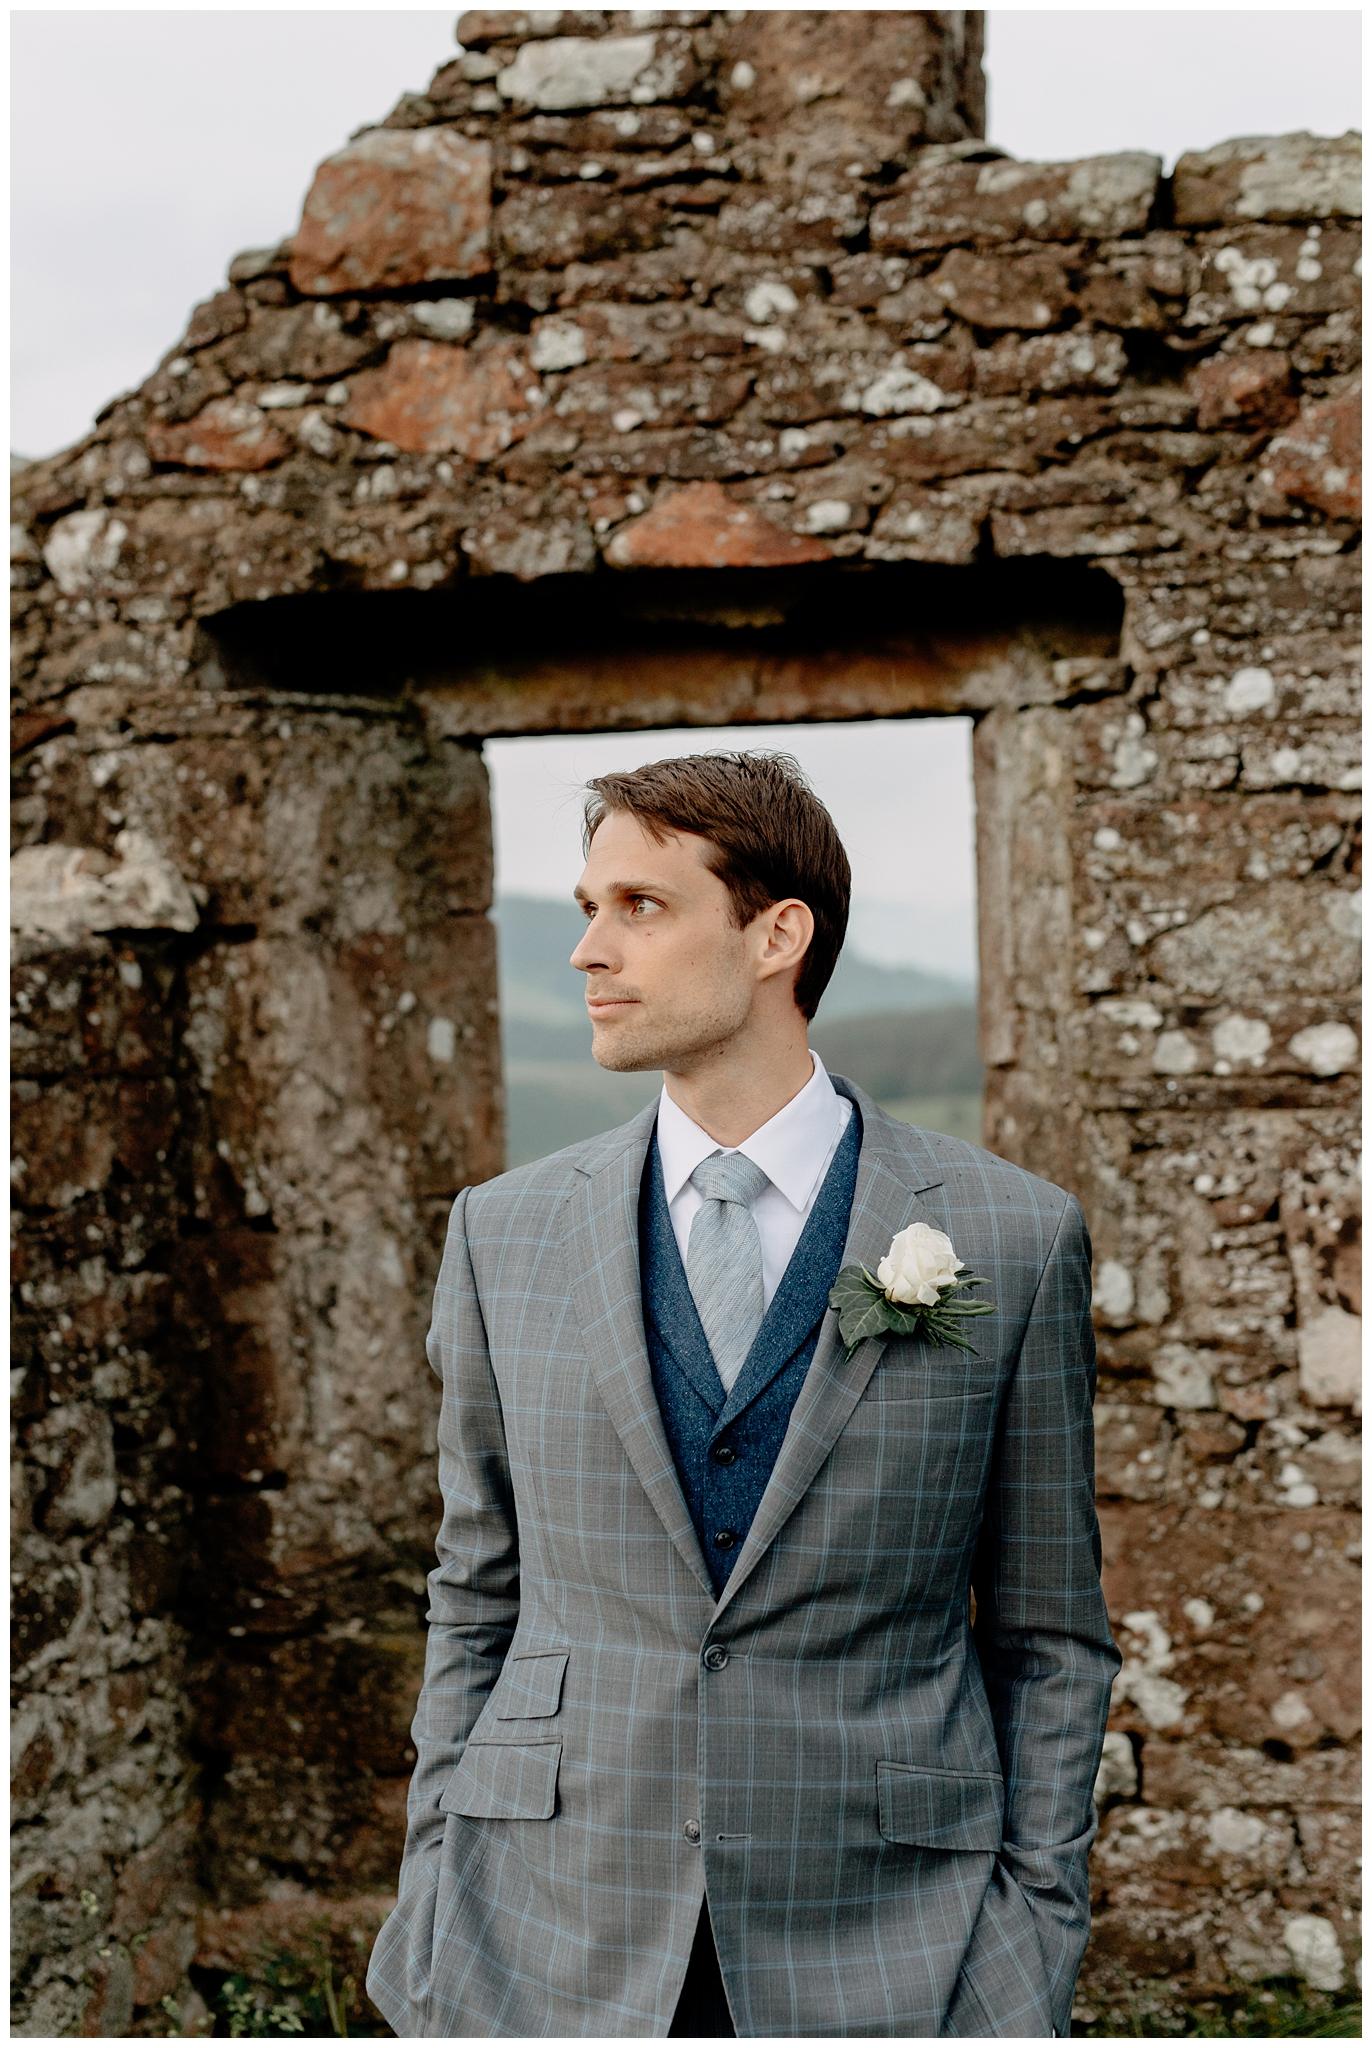 austin-texas-scottish-wedding-bride-groom22007.JPG